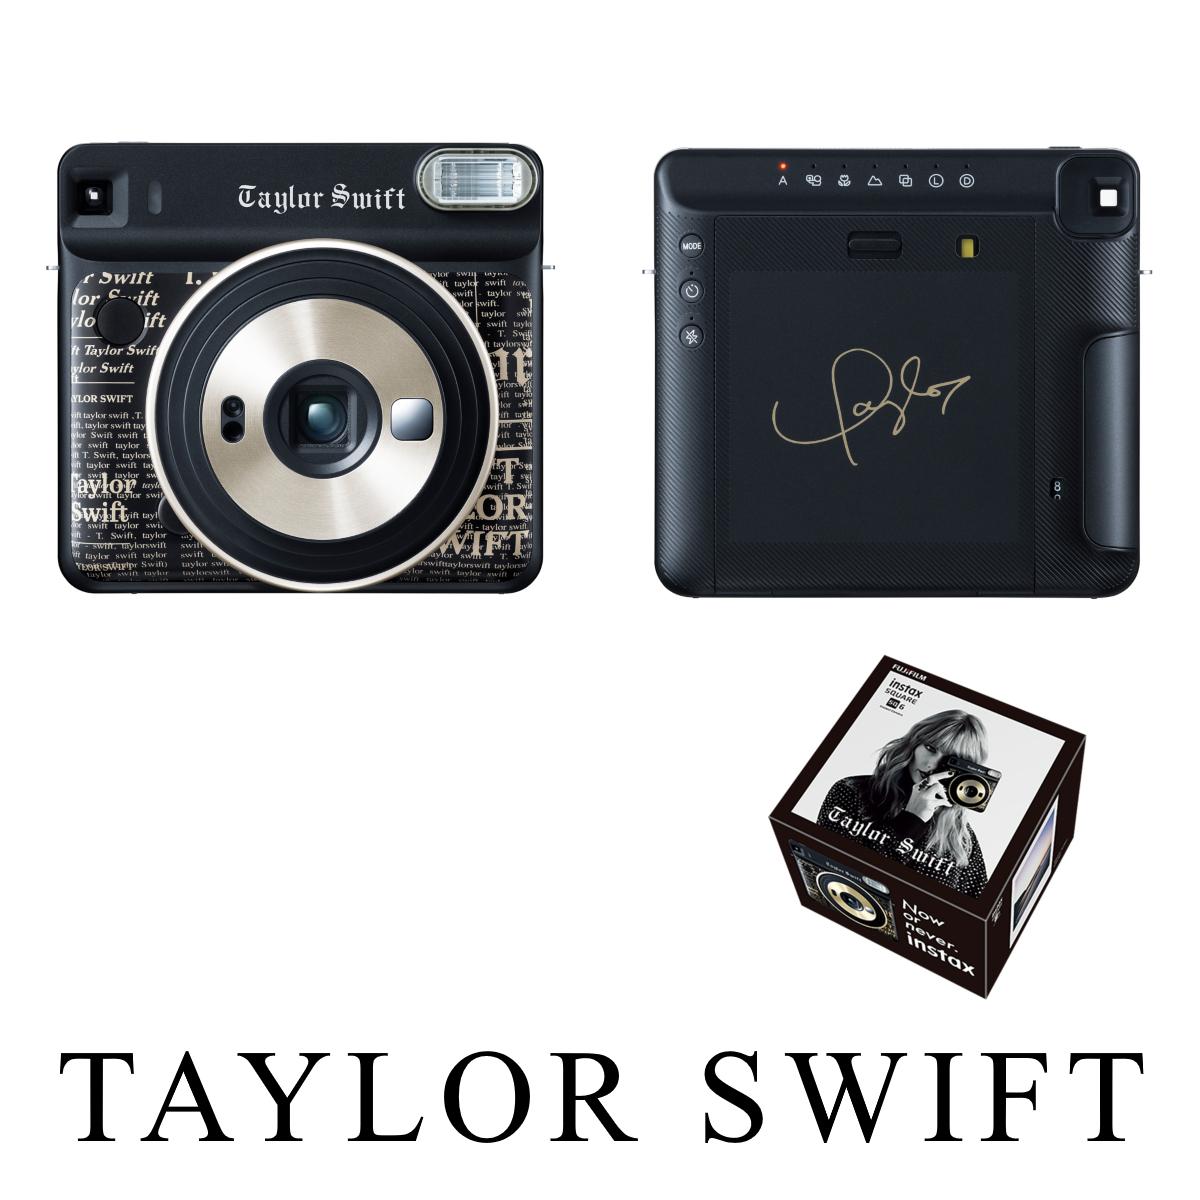 Taylor Swift *FUJIFILM*instax SQUARE SQ6 Taylor Swift Edition